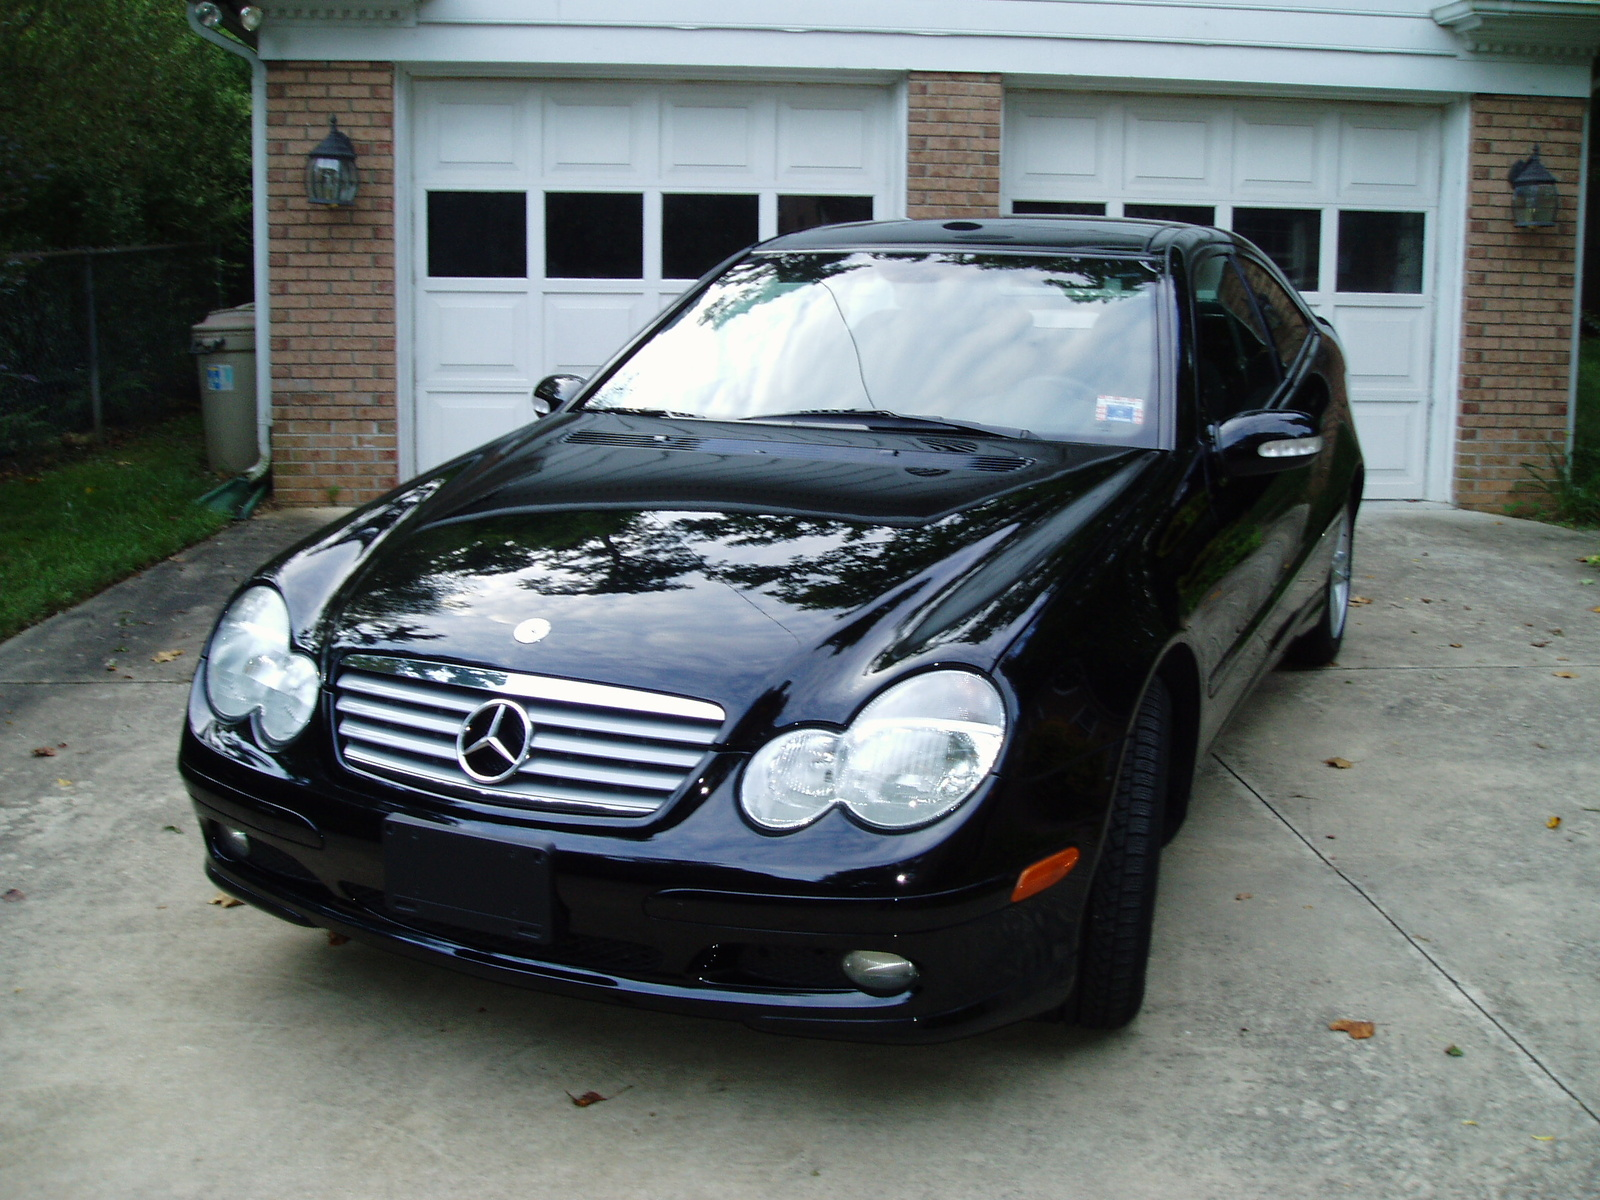 2004 Mercedes-Benz C-Class #2 Mercedes-Benz C-Class #2